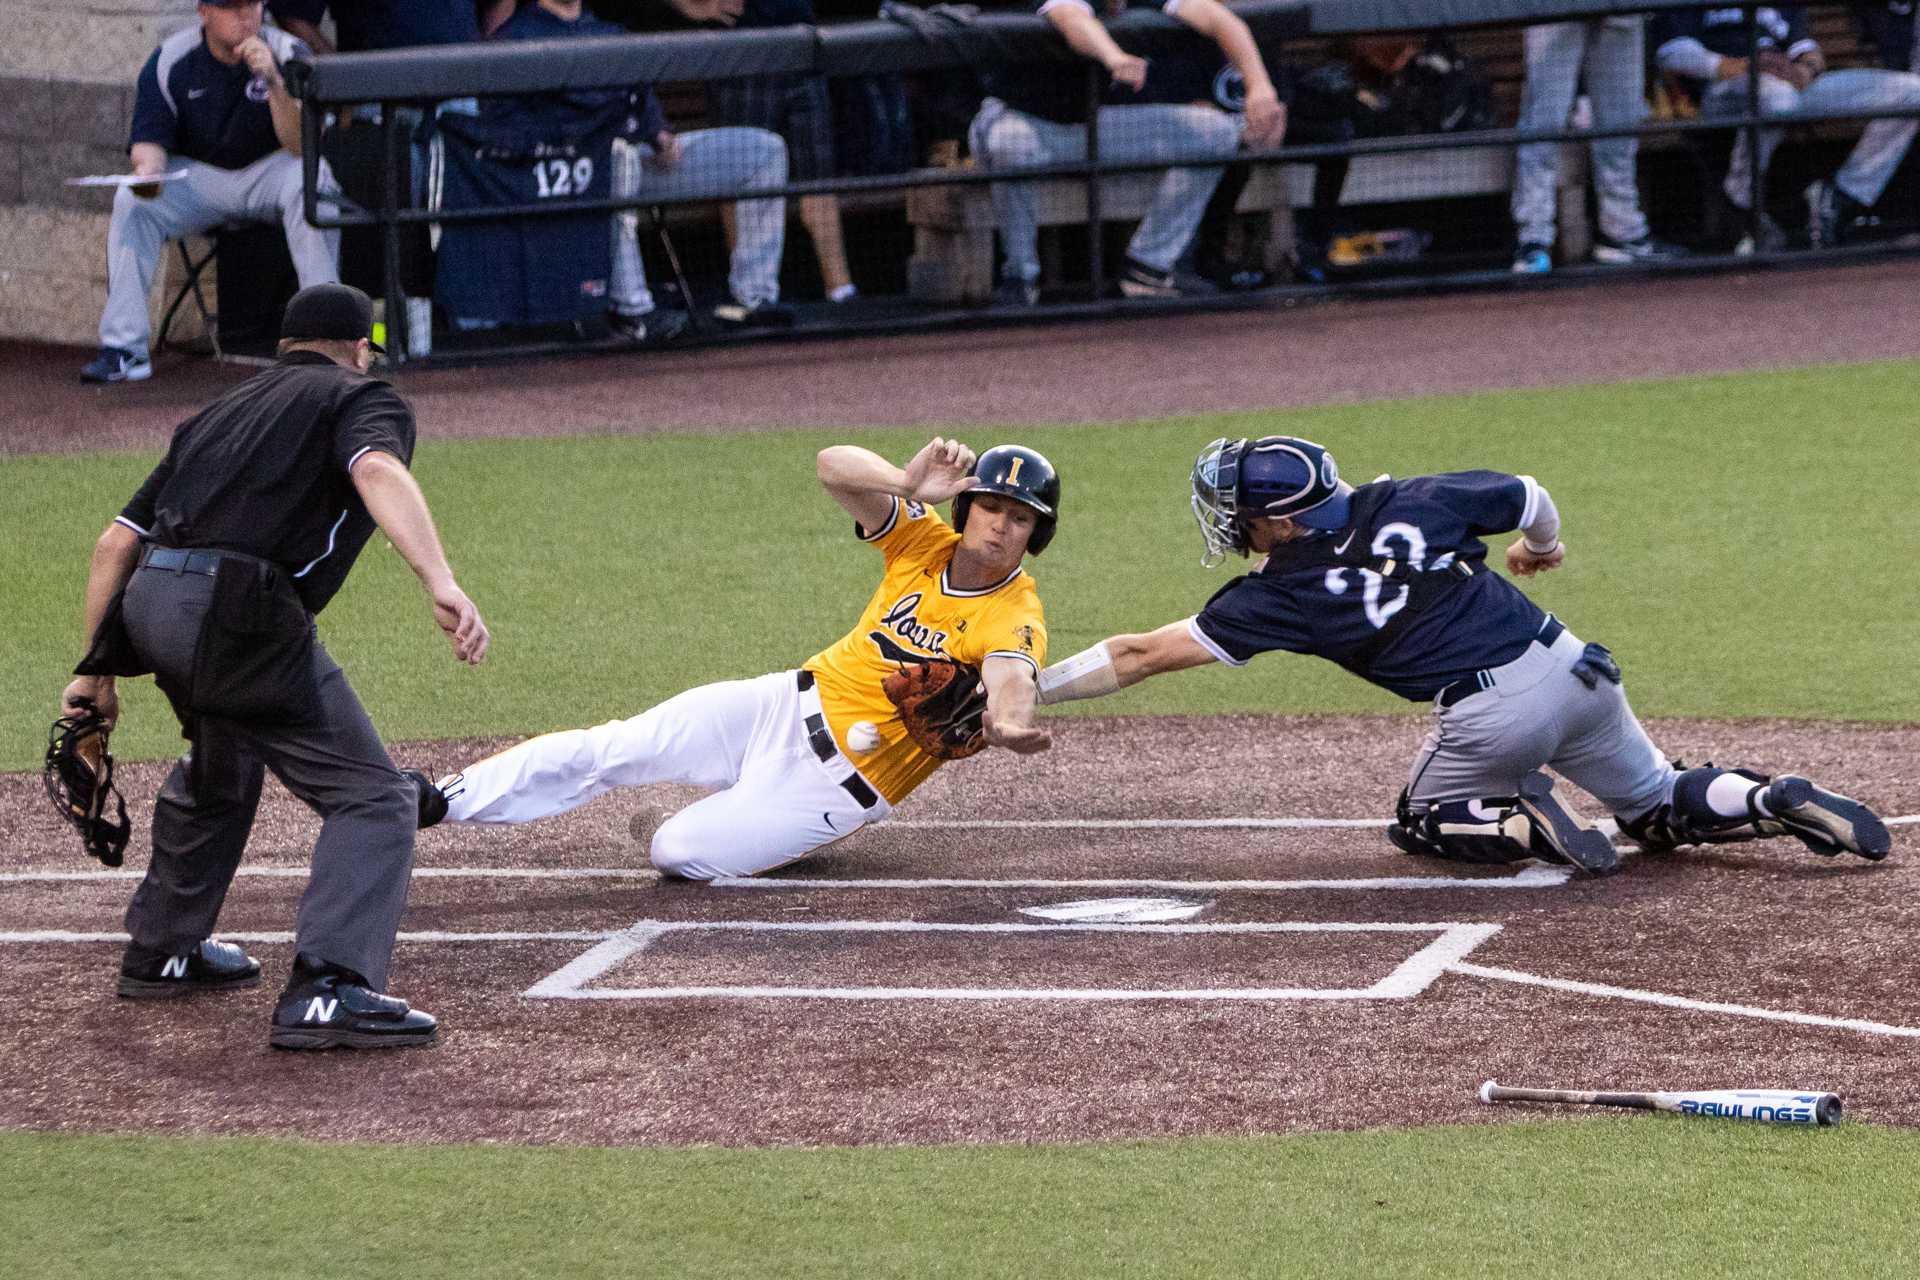 Iowa baseball sweeps Penn State, earns 6th seed in Big Ten Tournament